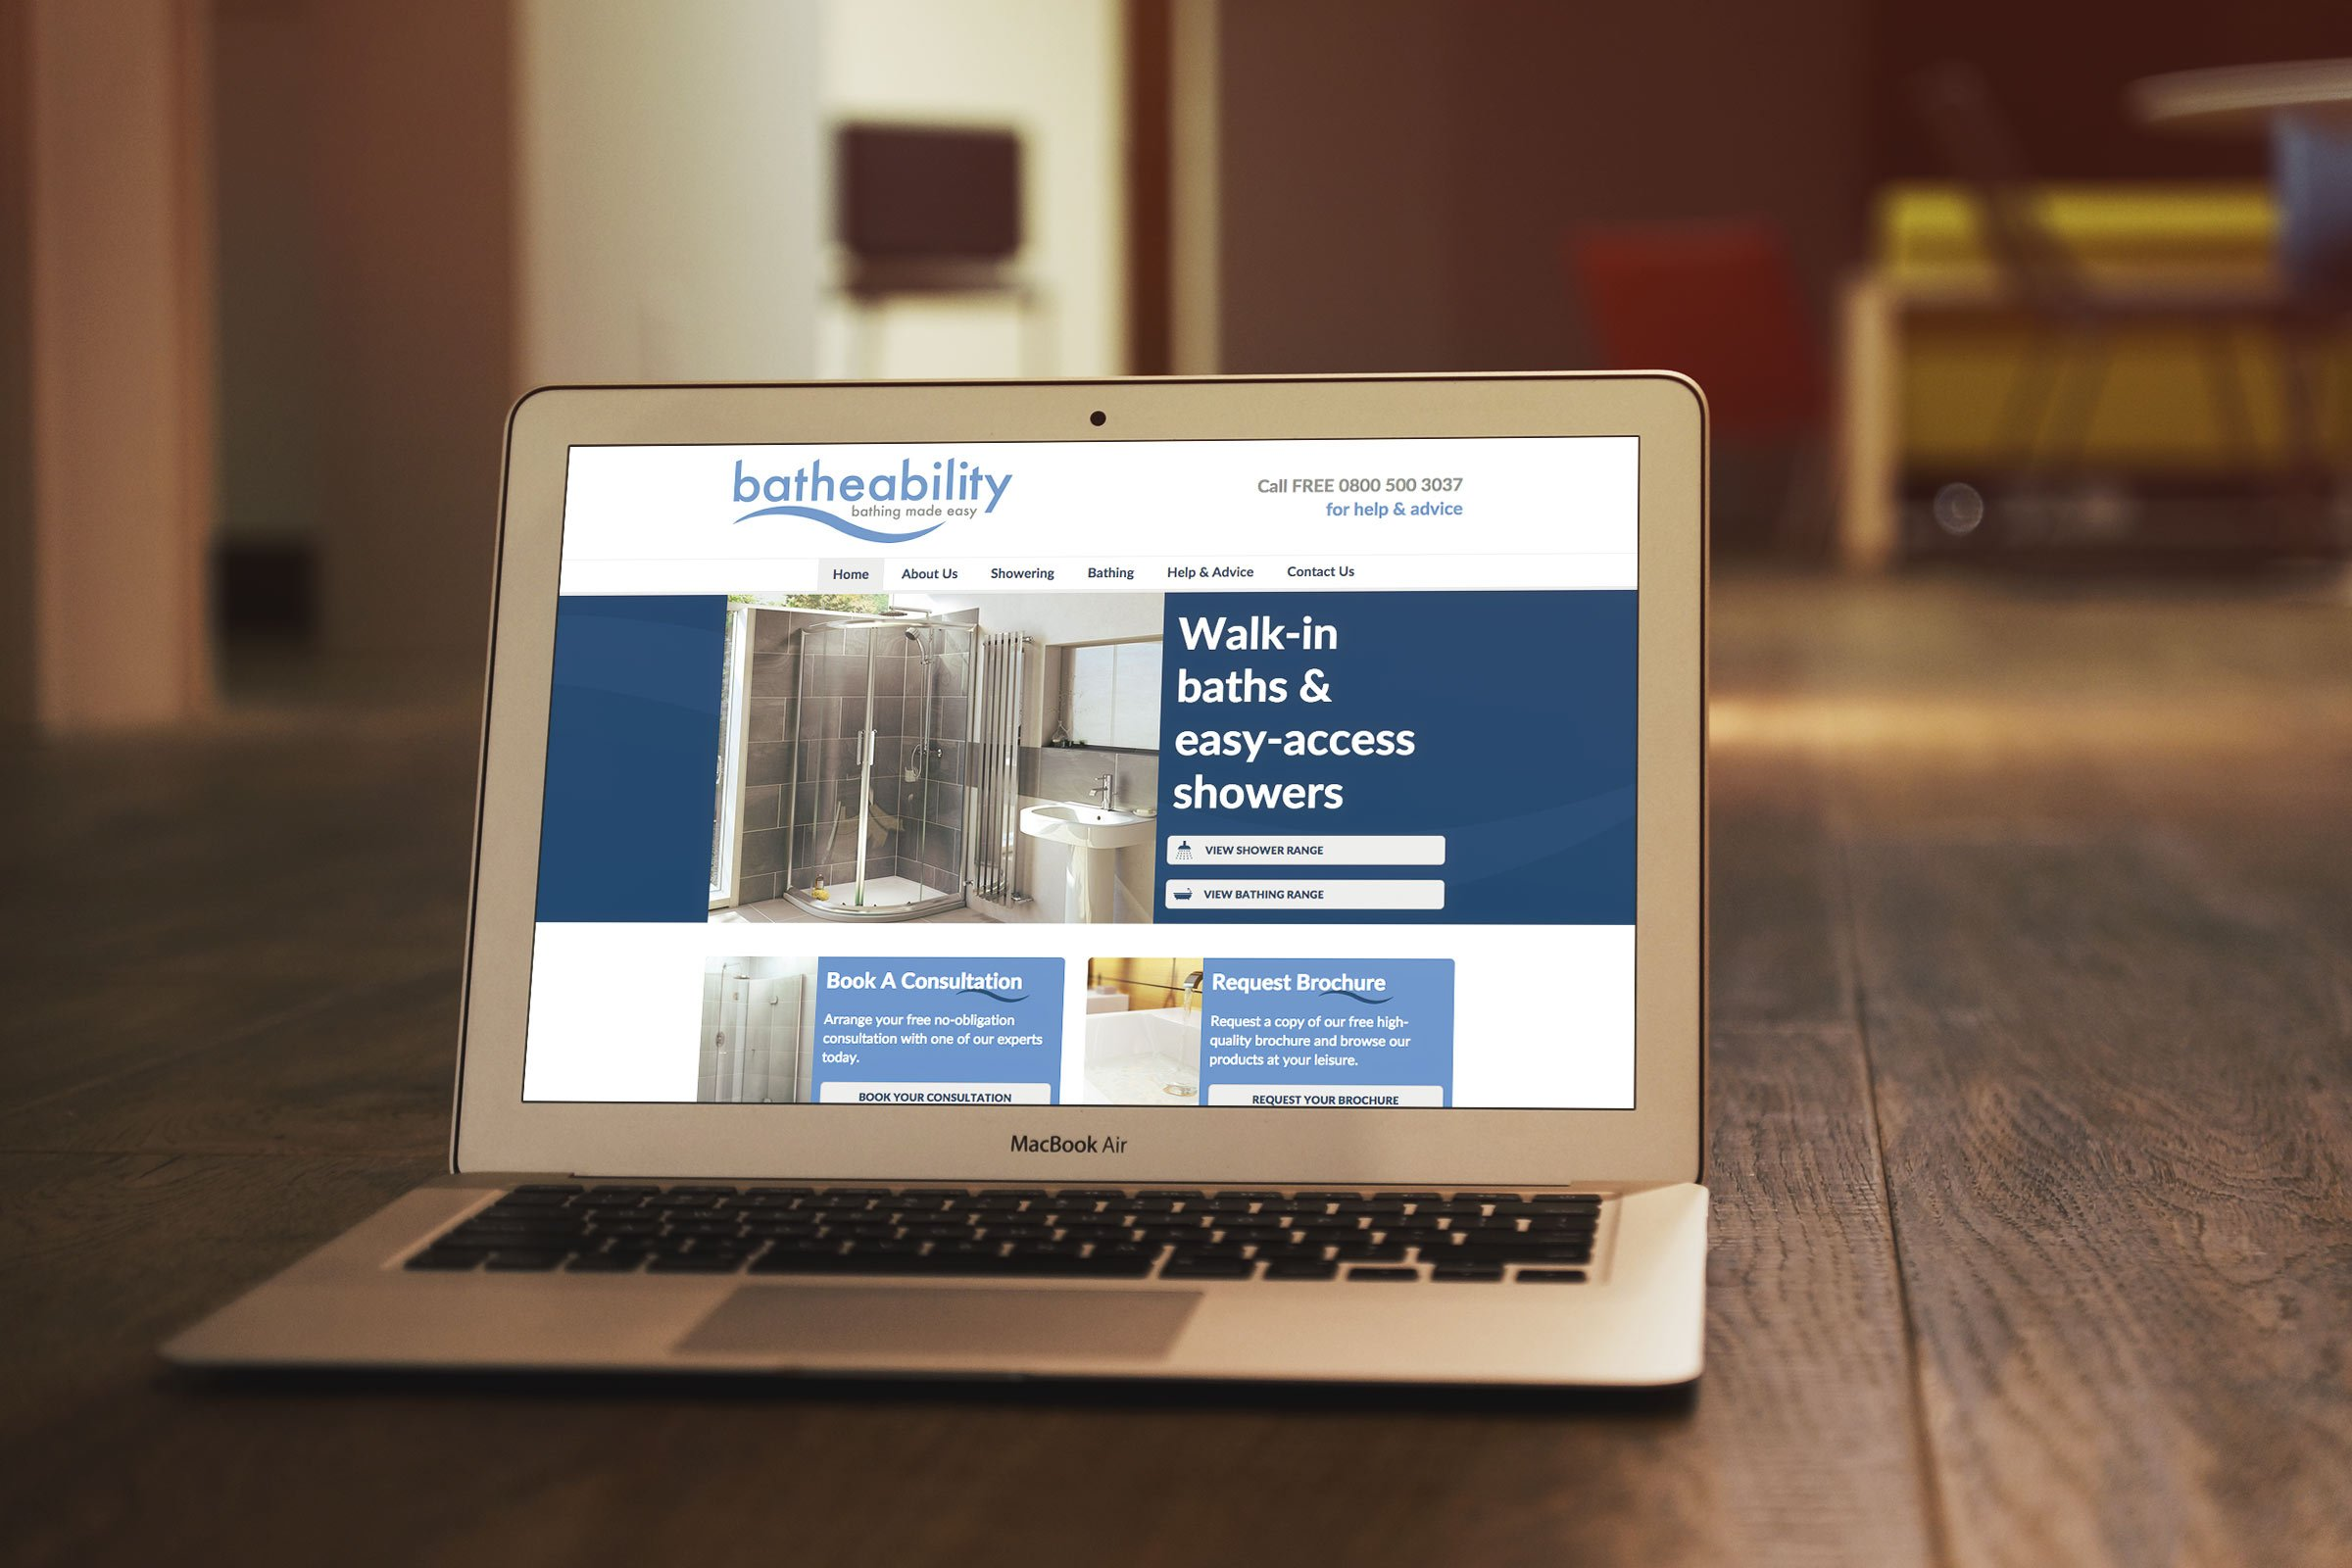 Batheability website displayed on laptop